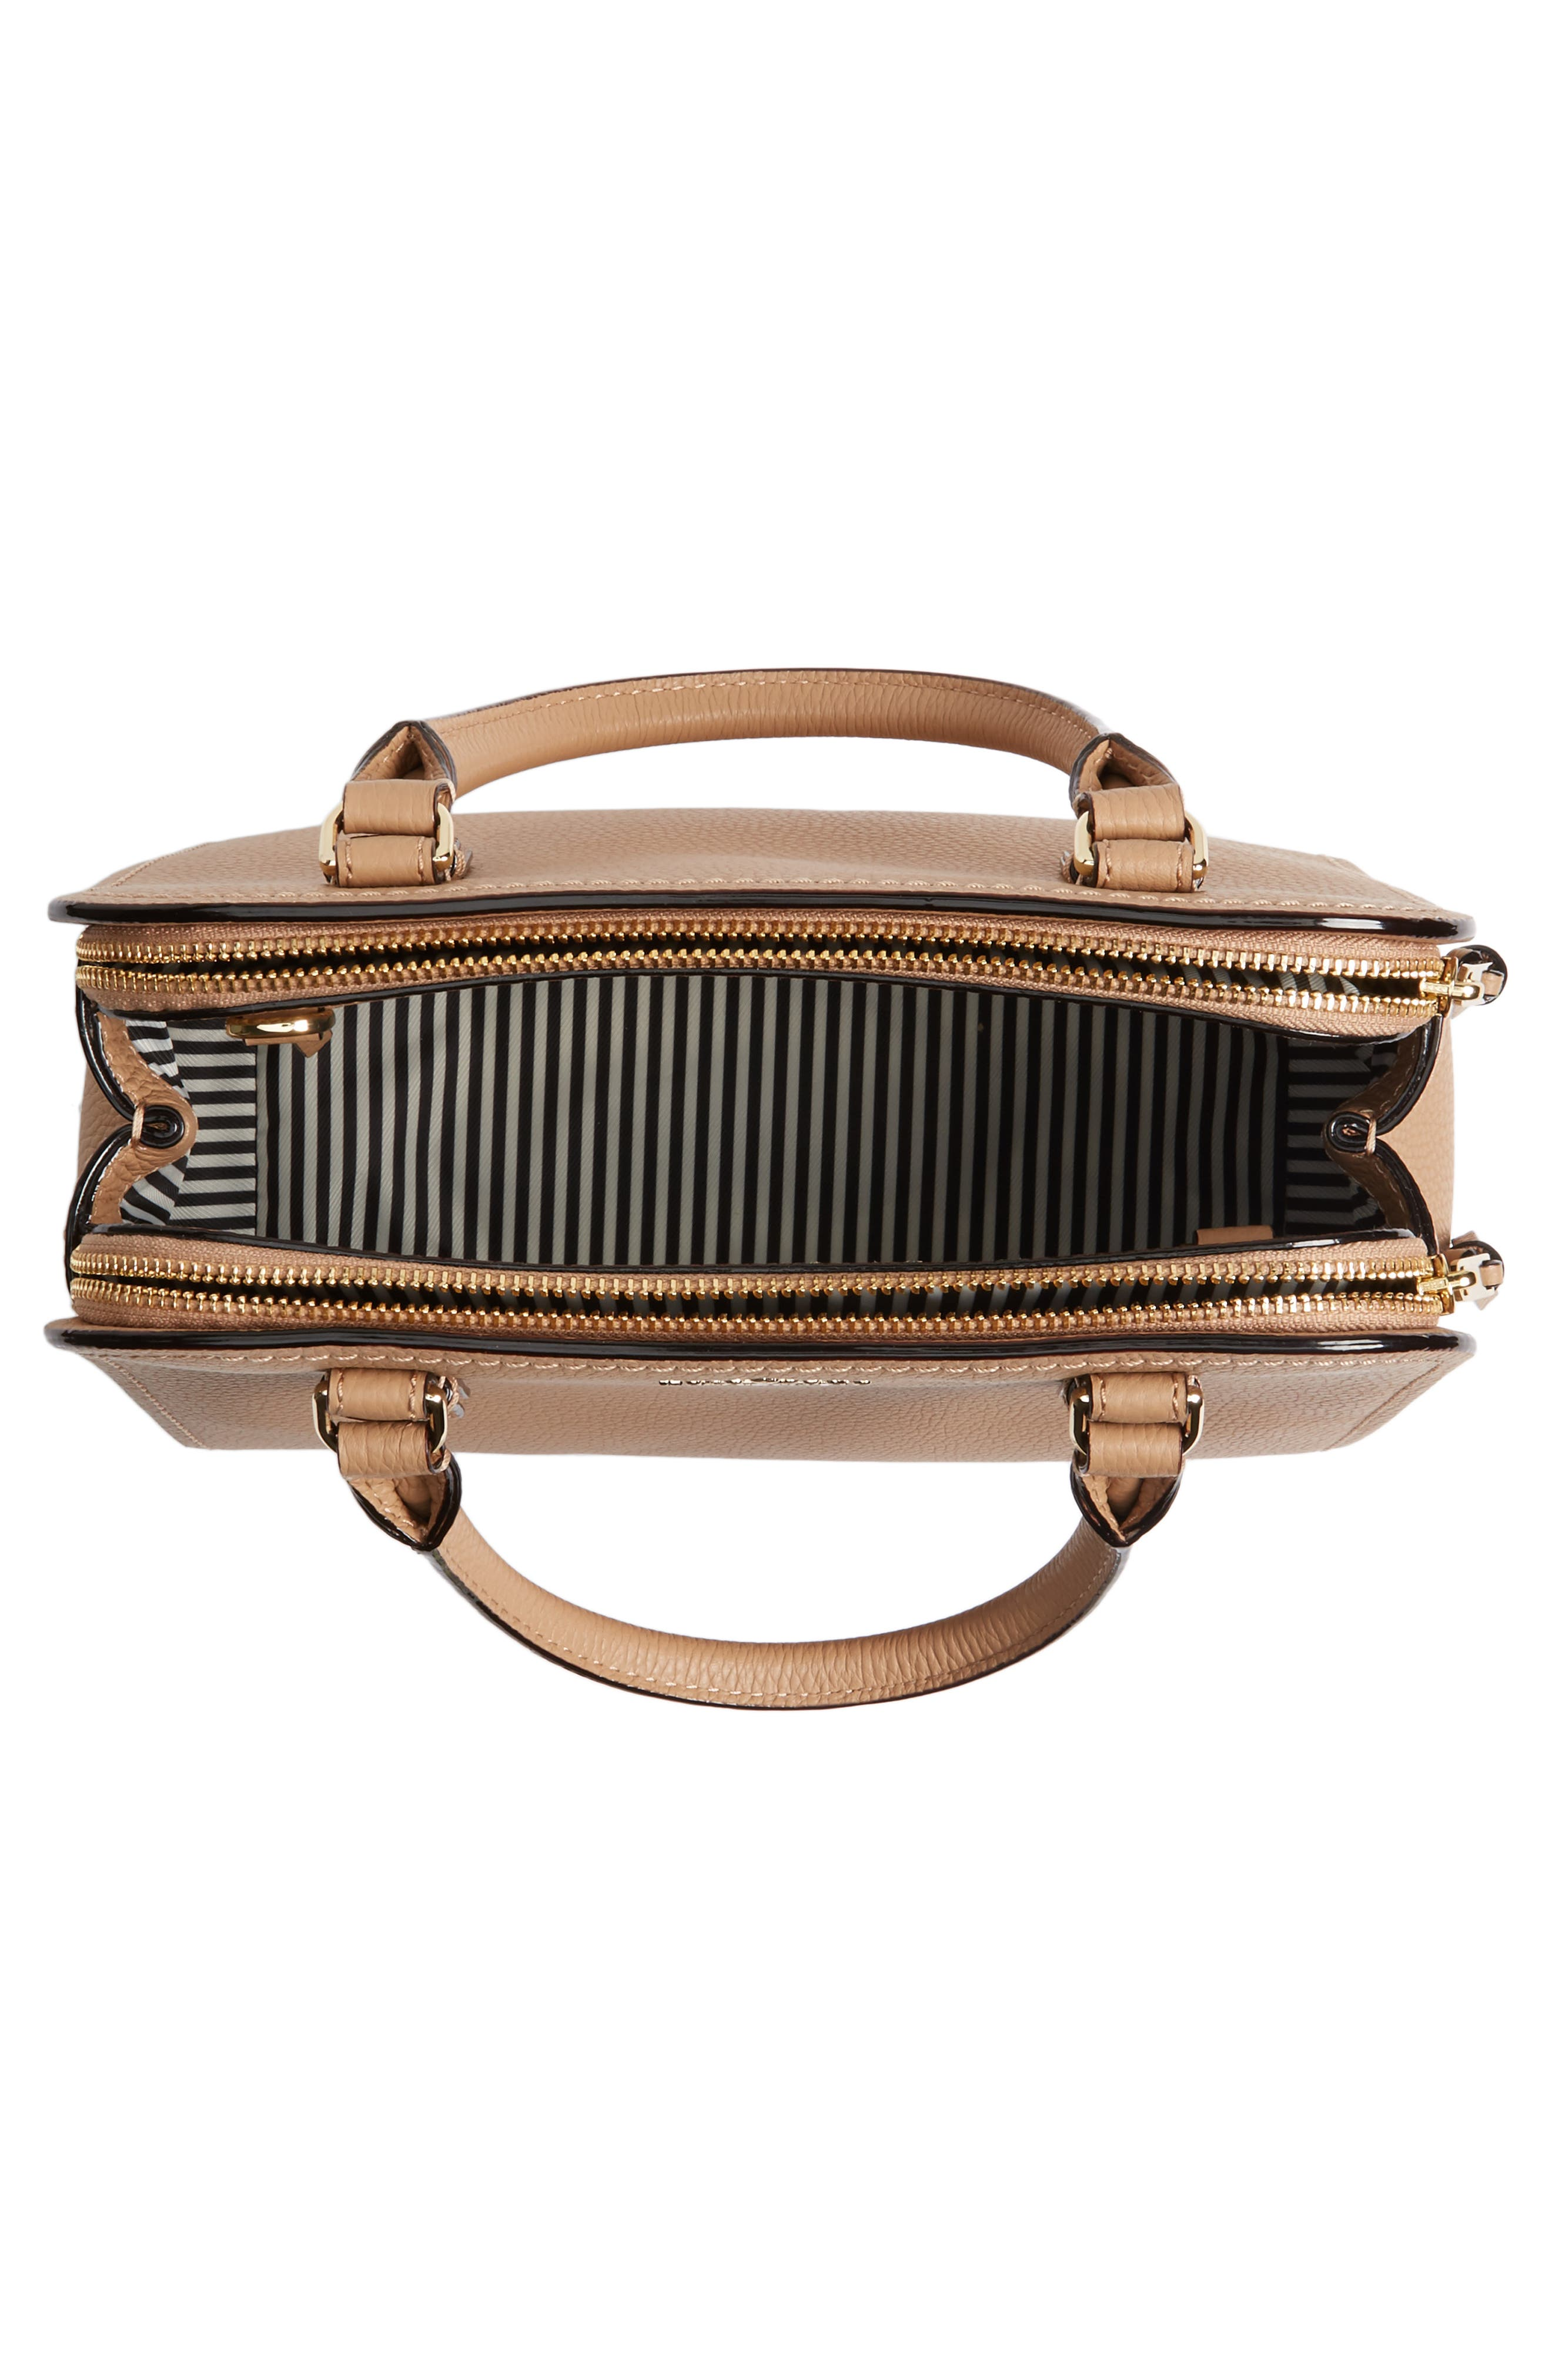 jackson street small kiernan leather top handle satchel,                             Alternate thumbnail 4, color,                             Hazel